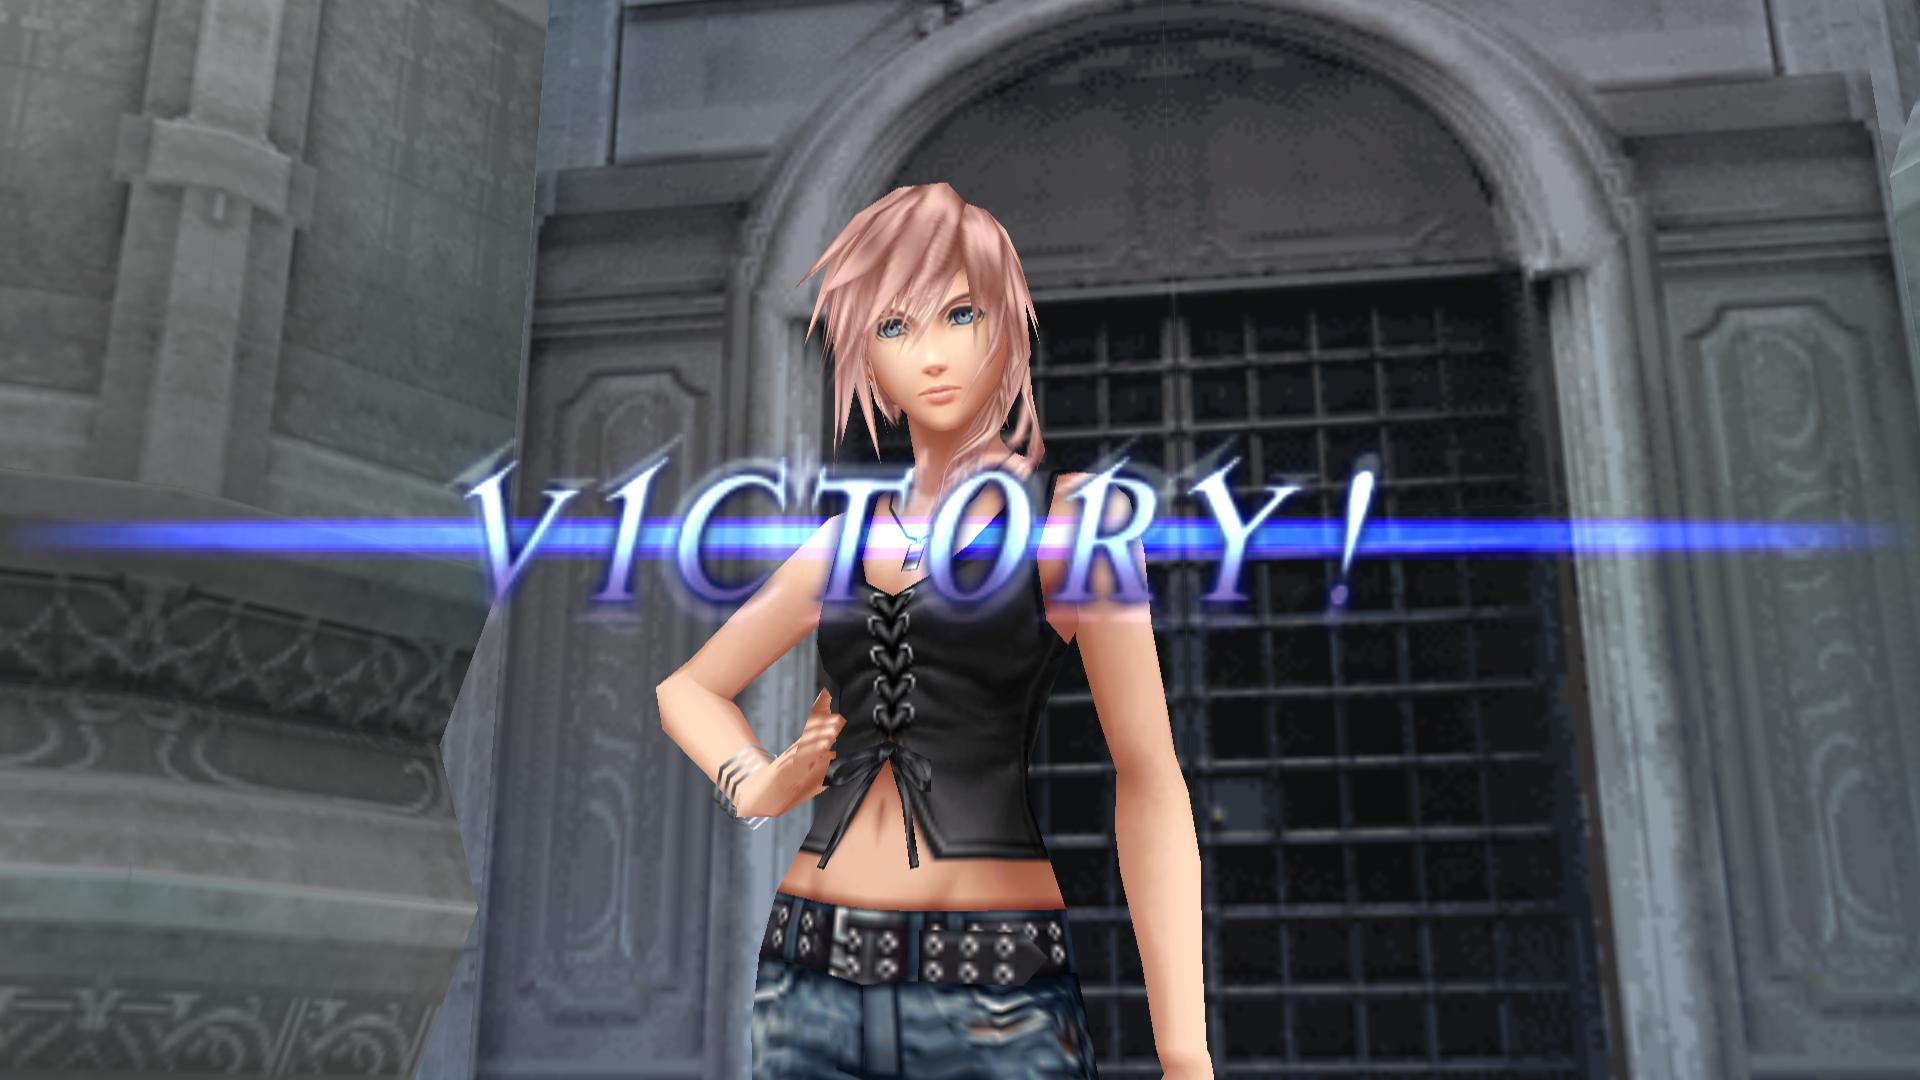 Image credit: Final Fantasy Wikia